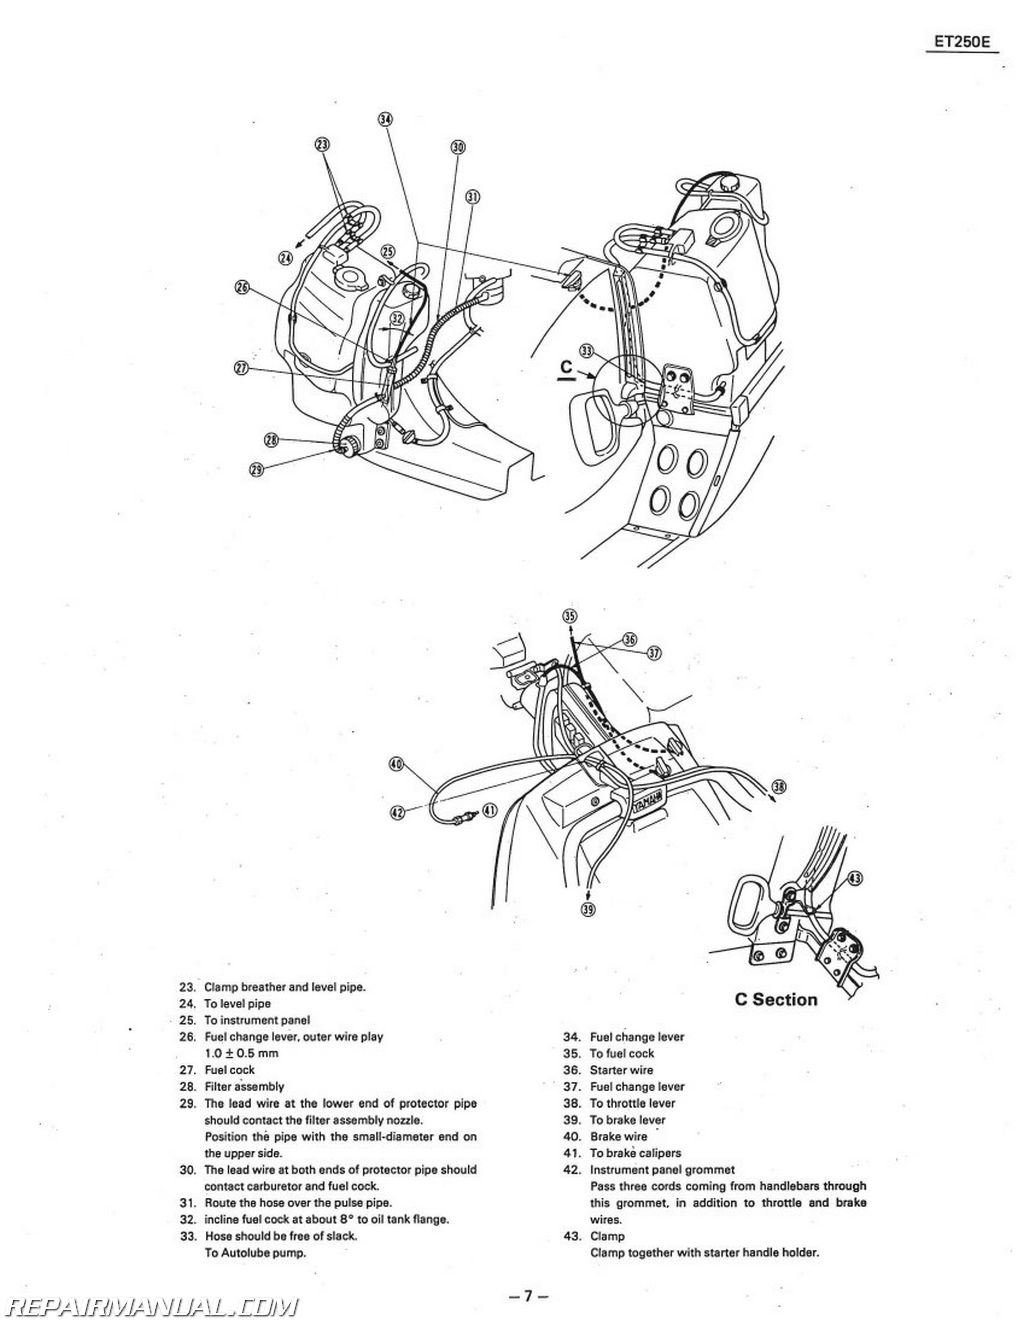 Et 250 Wiring Diagram Circuit Schematic Simple U2022 Basic House Diagrams